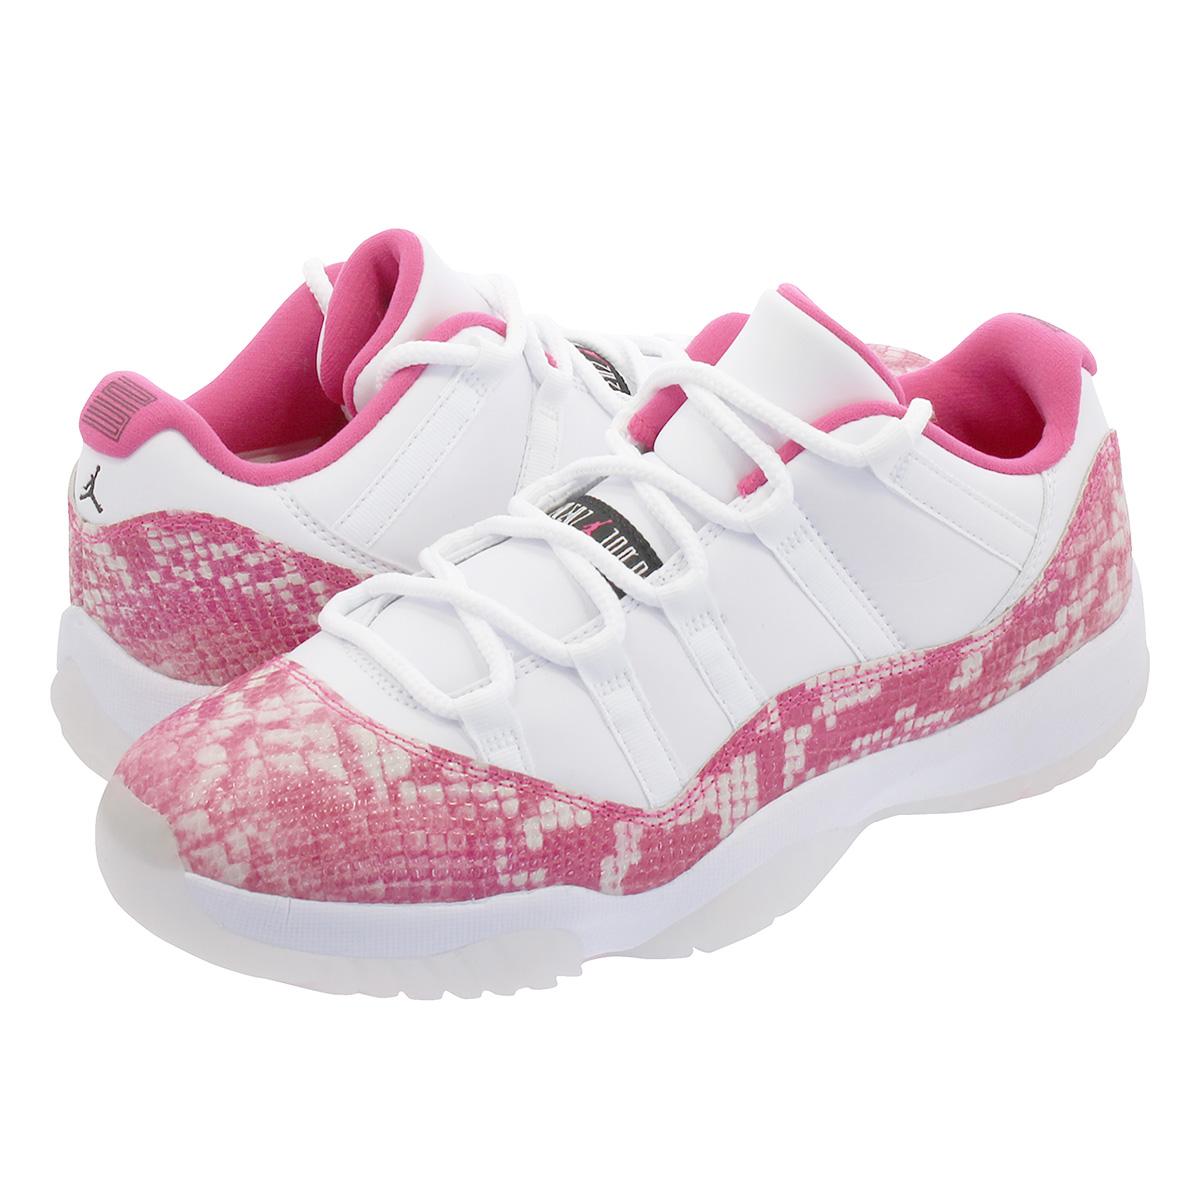 half off 2e495 043e9 NIKE WMNS AIR JORDAN 11 LOW Nike women Air Jordan 11 low WHITE/BLACK/RUST  PINK ah7860-106